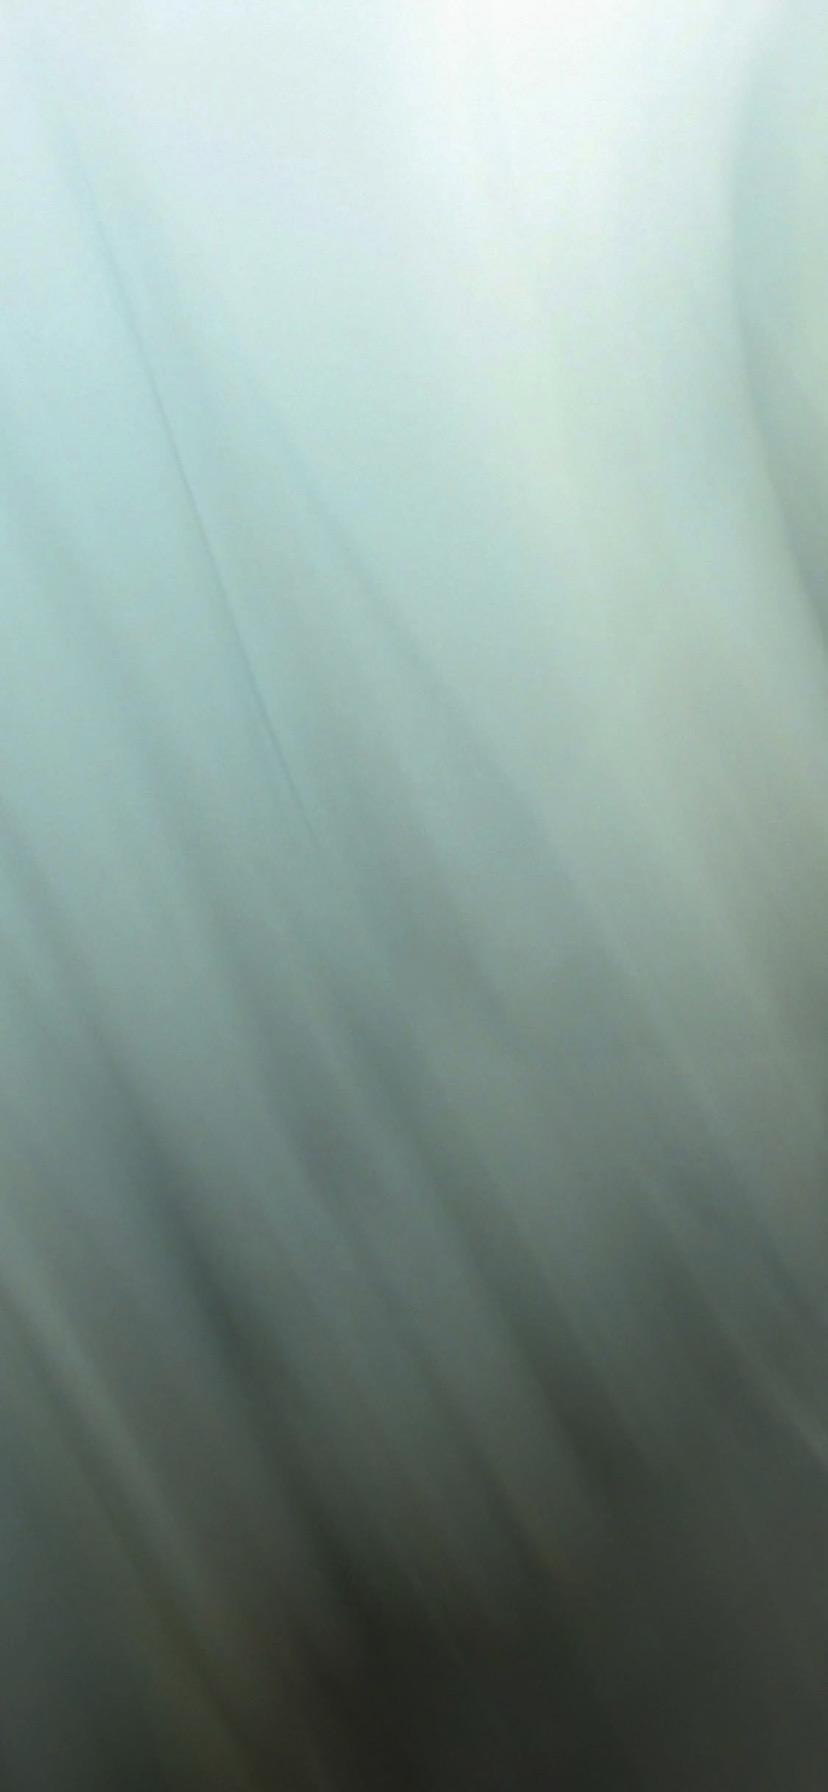 iPhone XR 壁紙 wallpaper 0059